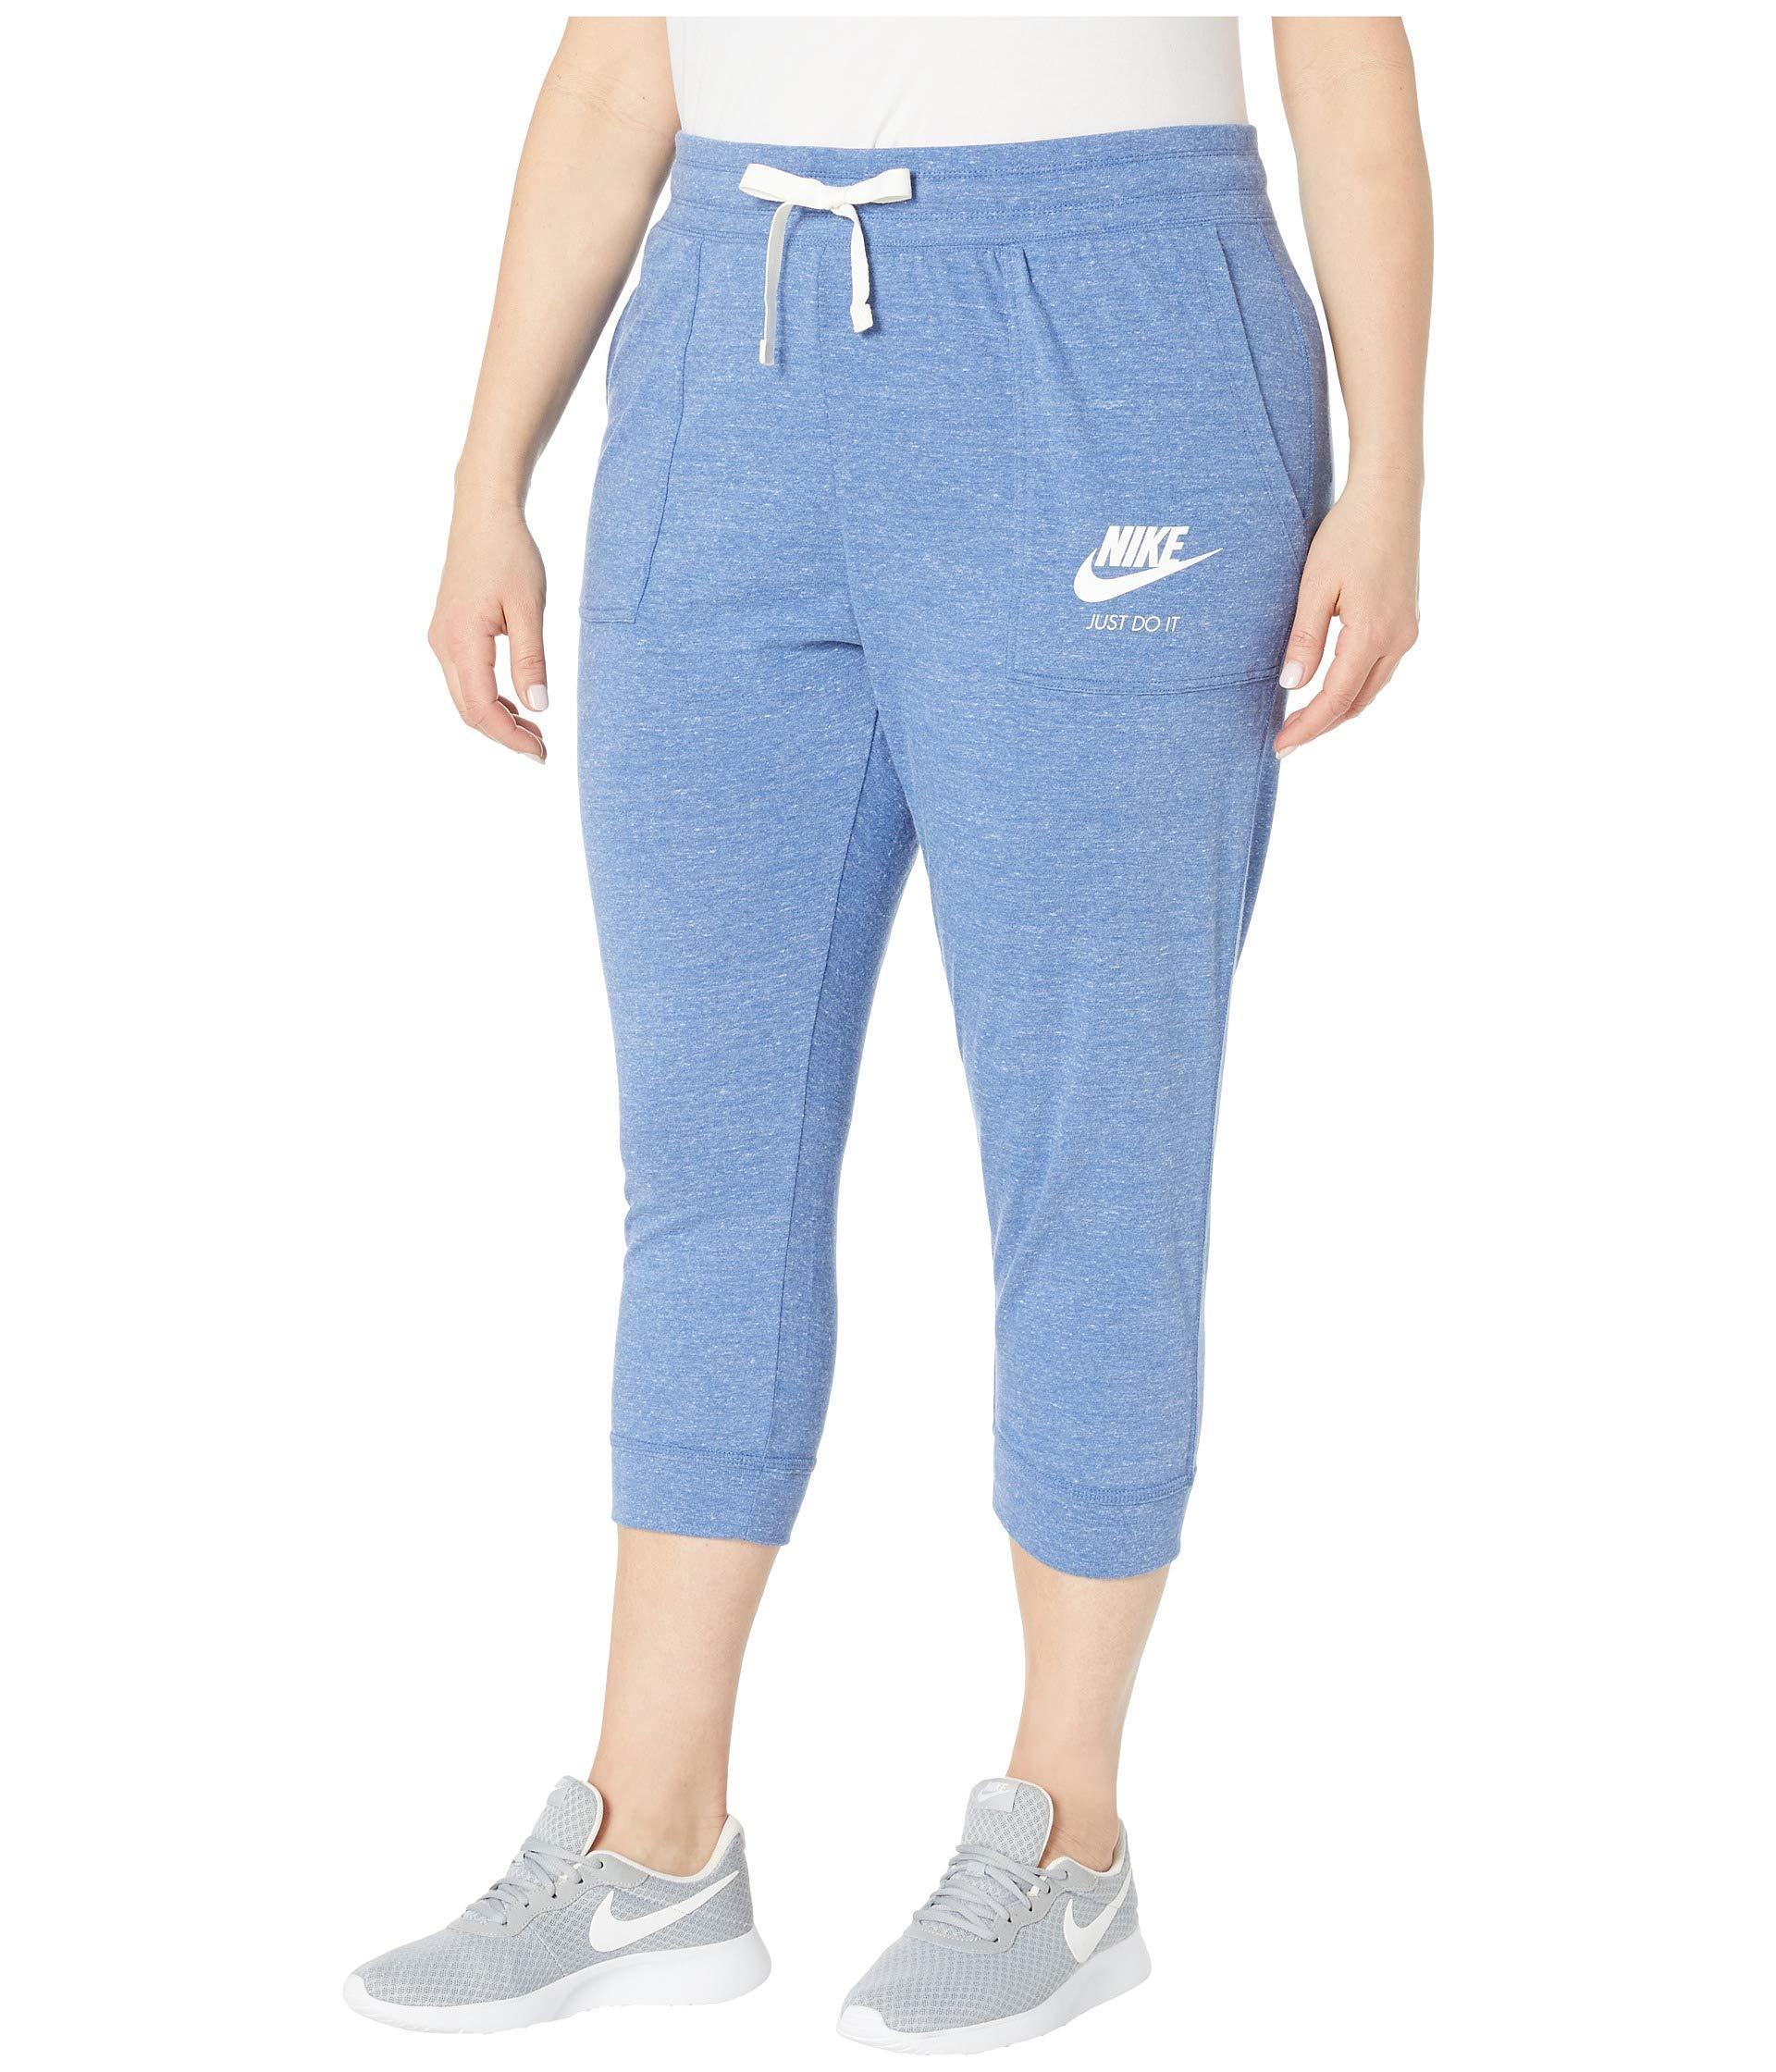 67b43afe41d3 Lyst - Nike Plus Size Gym Vintage Extended Capris (indigo Storm sail)  Women s Casual Pants in Blue